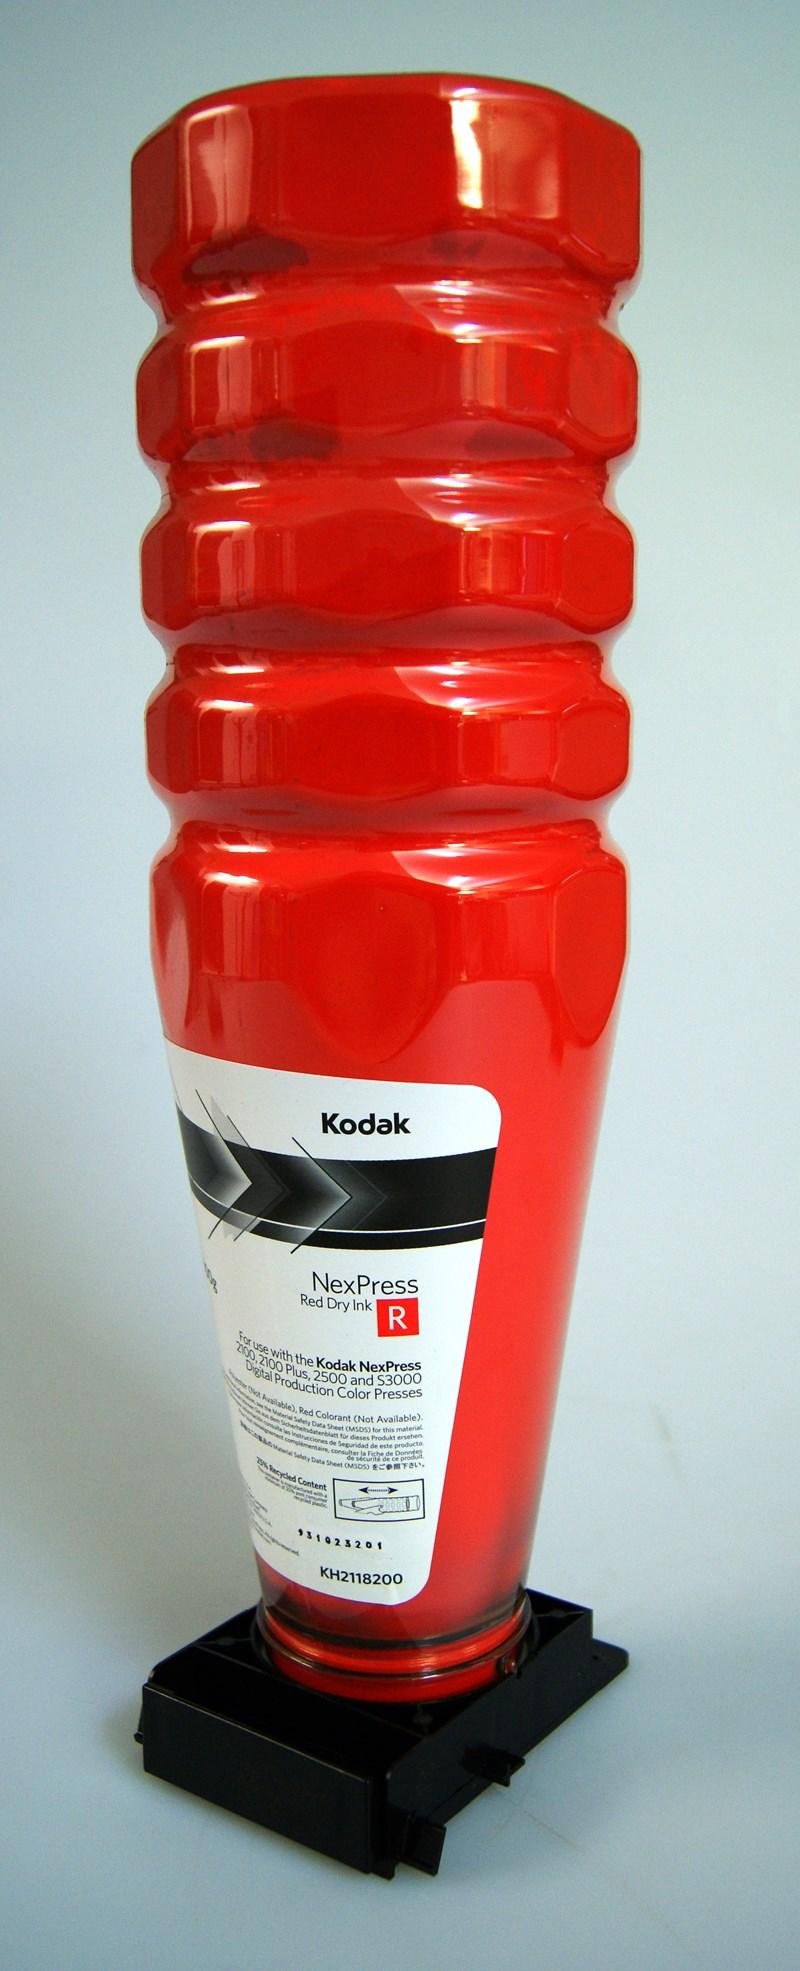 Kodak NexPress Red Dry Ink R